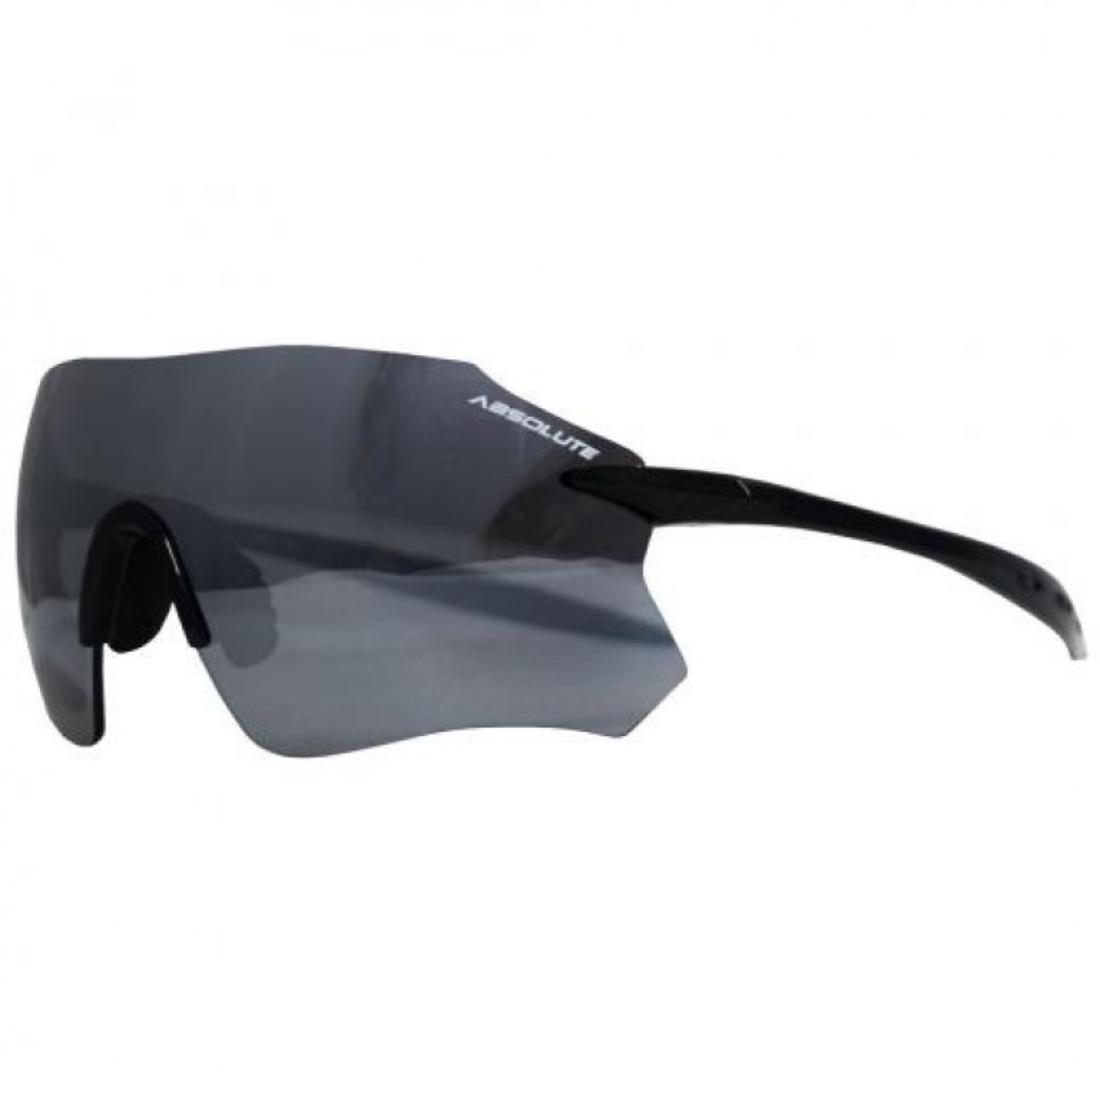 Óculos Absolute Prime Sl 400 Uv Mtb Ciclismo Bike